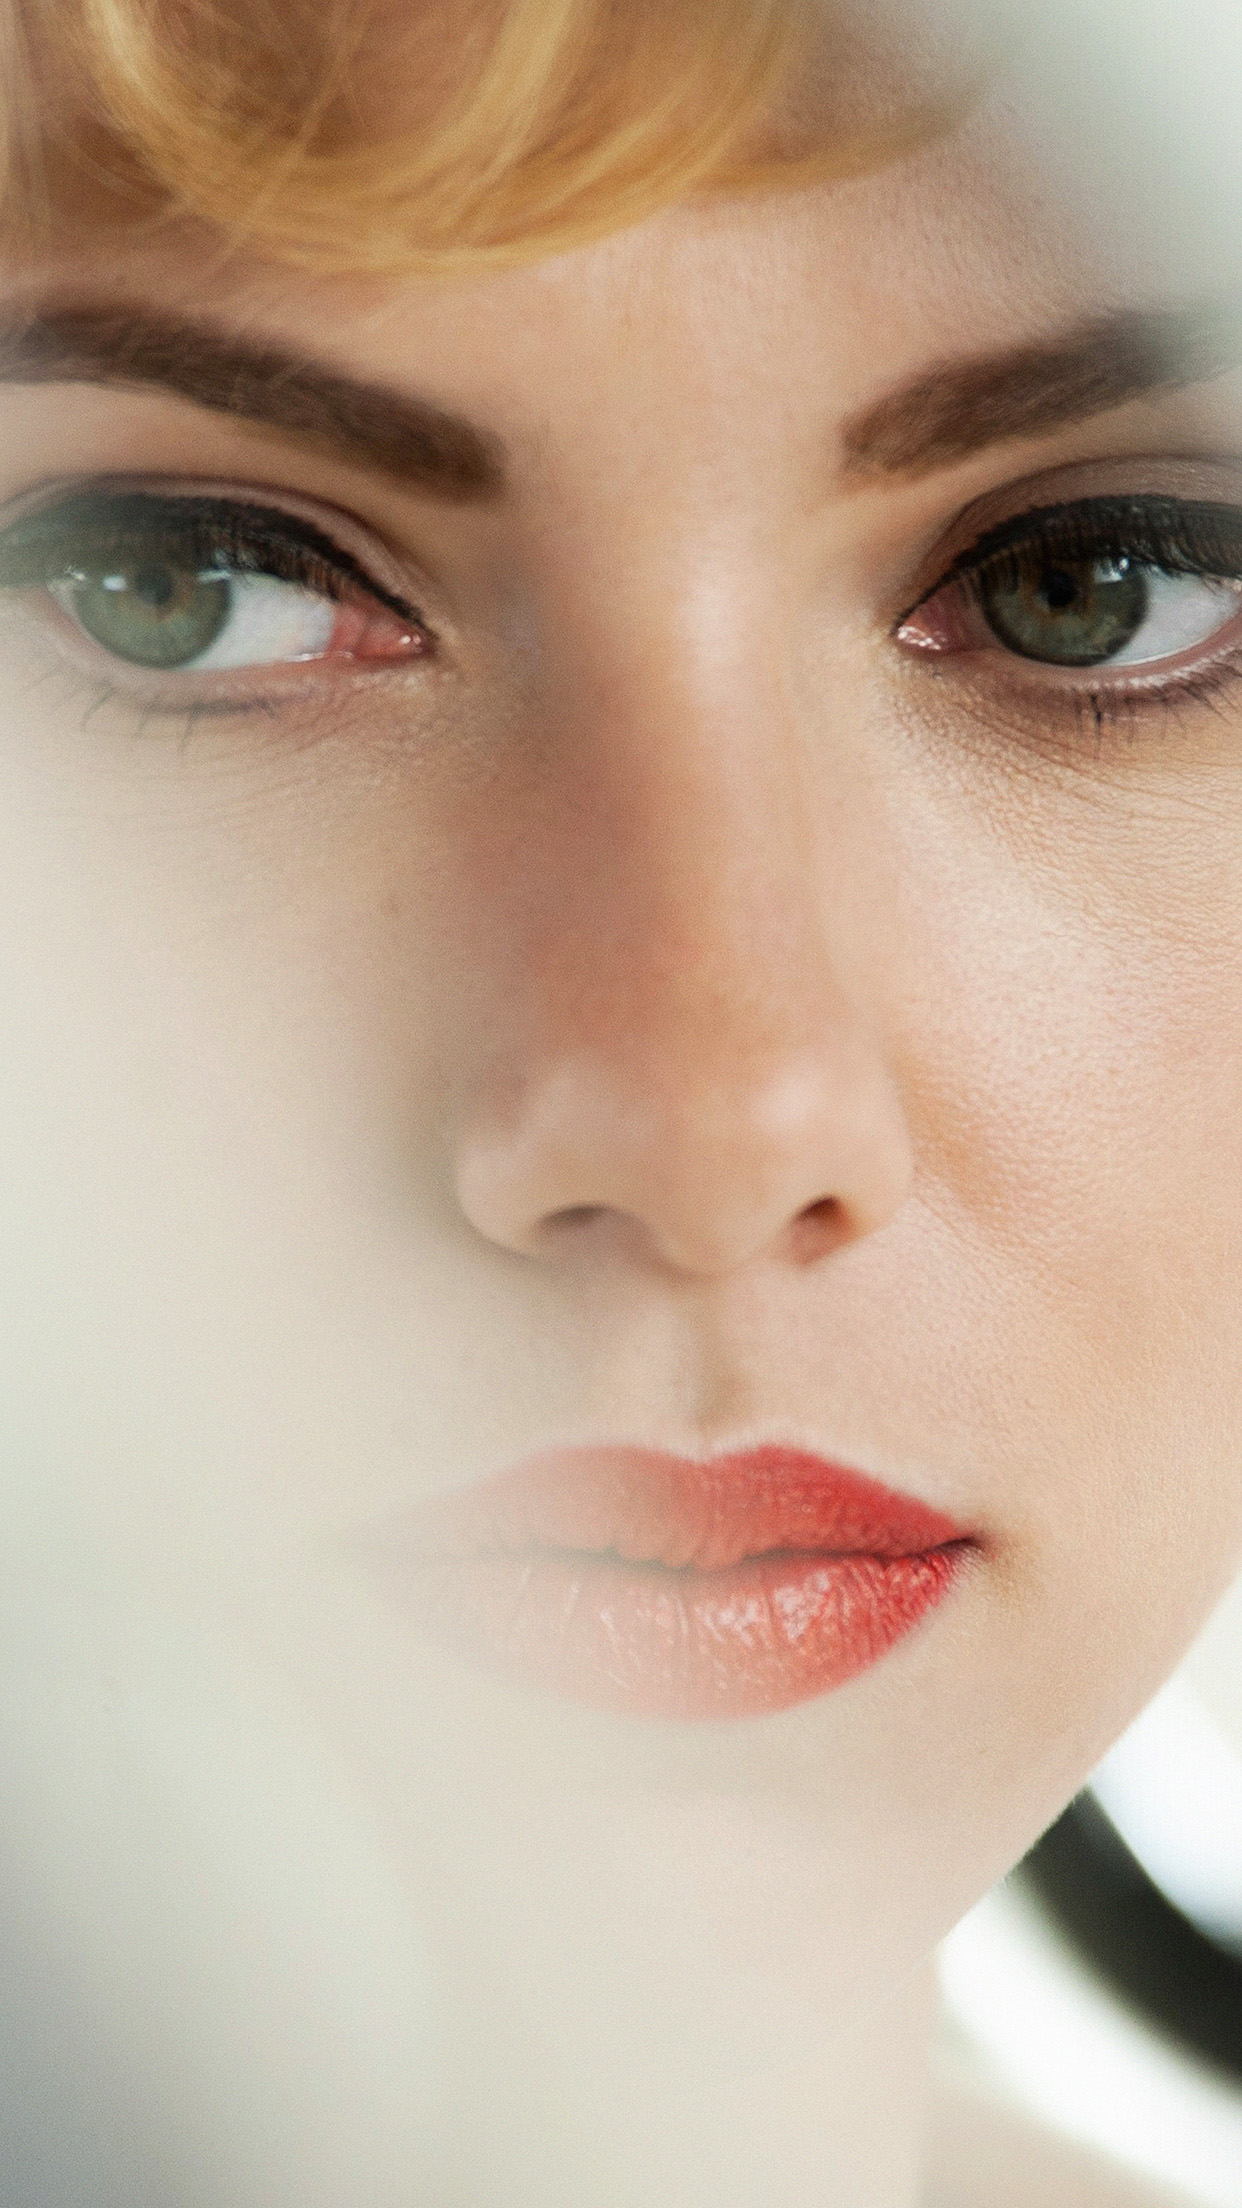 Hl34 Scarlett Johansson Face Actress Celebrity